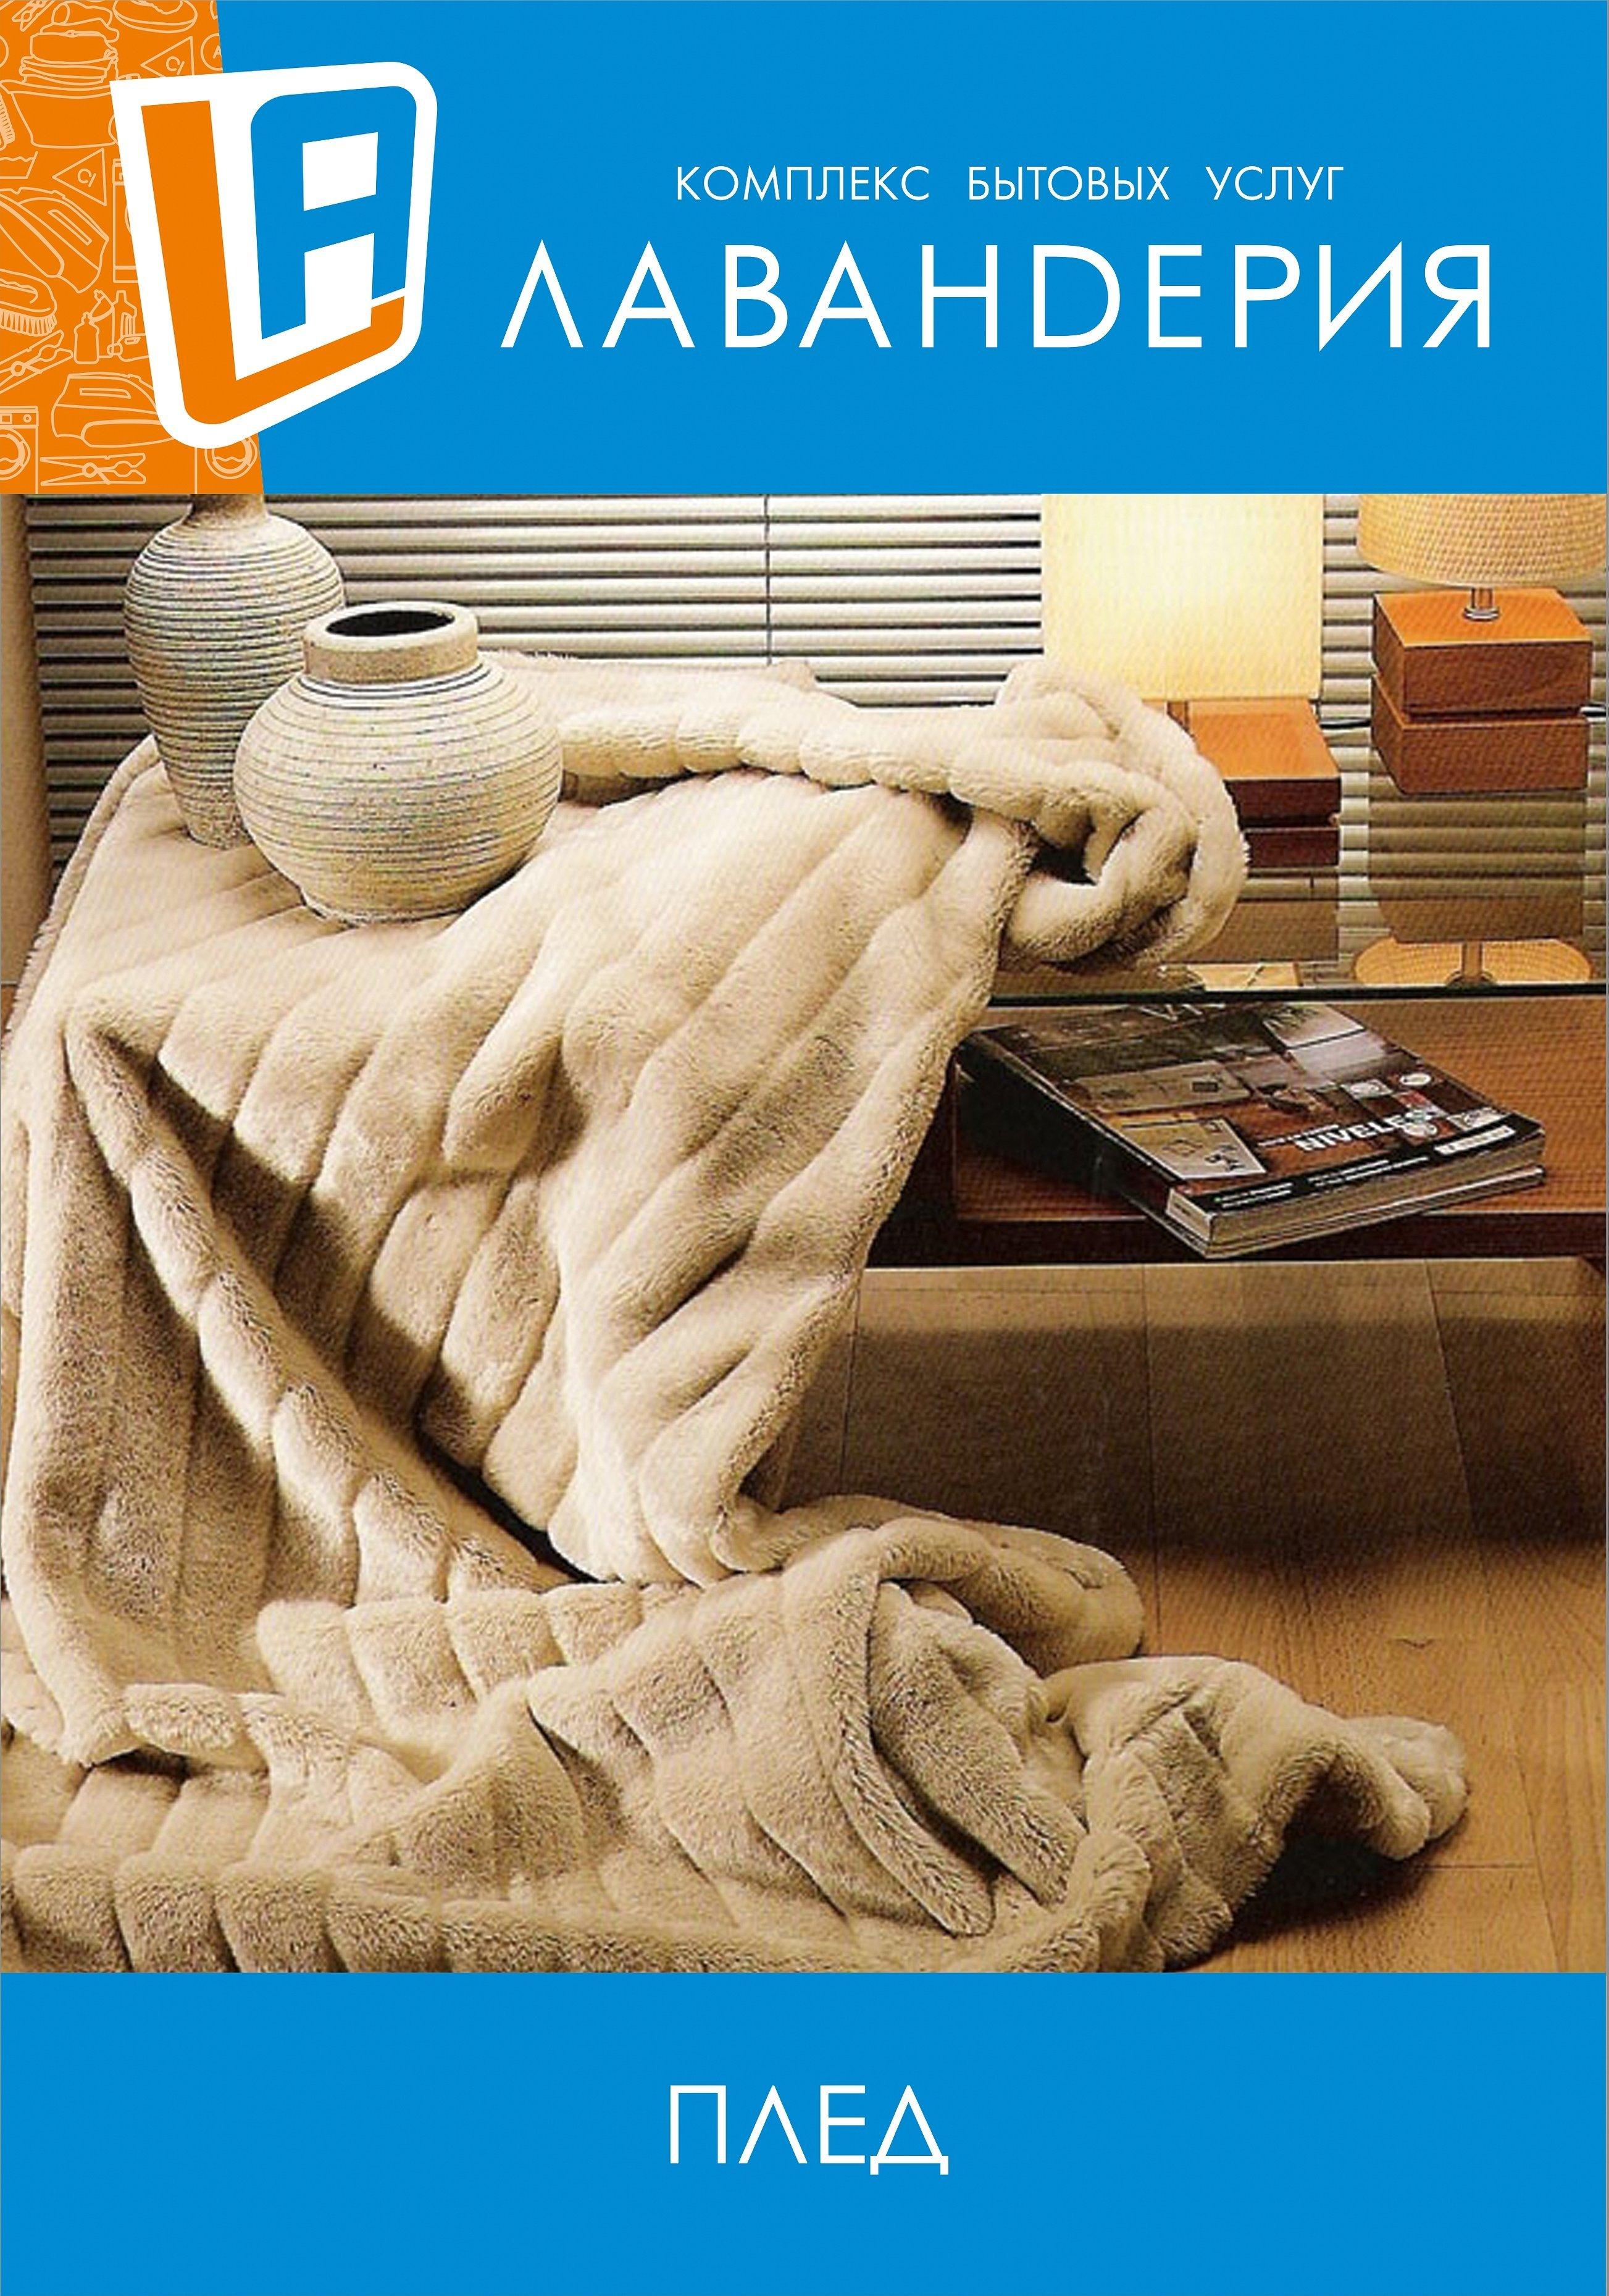 Одеяло плед уютные